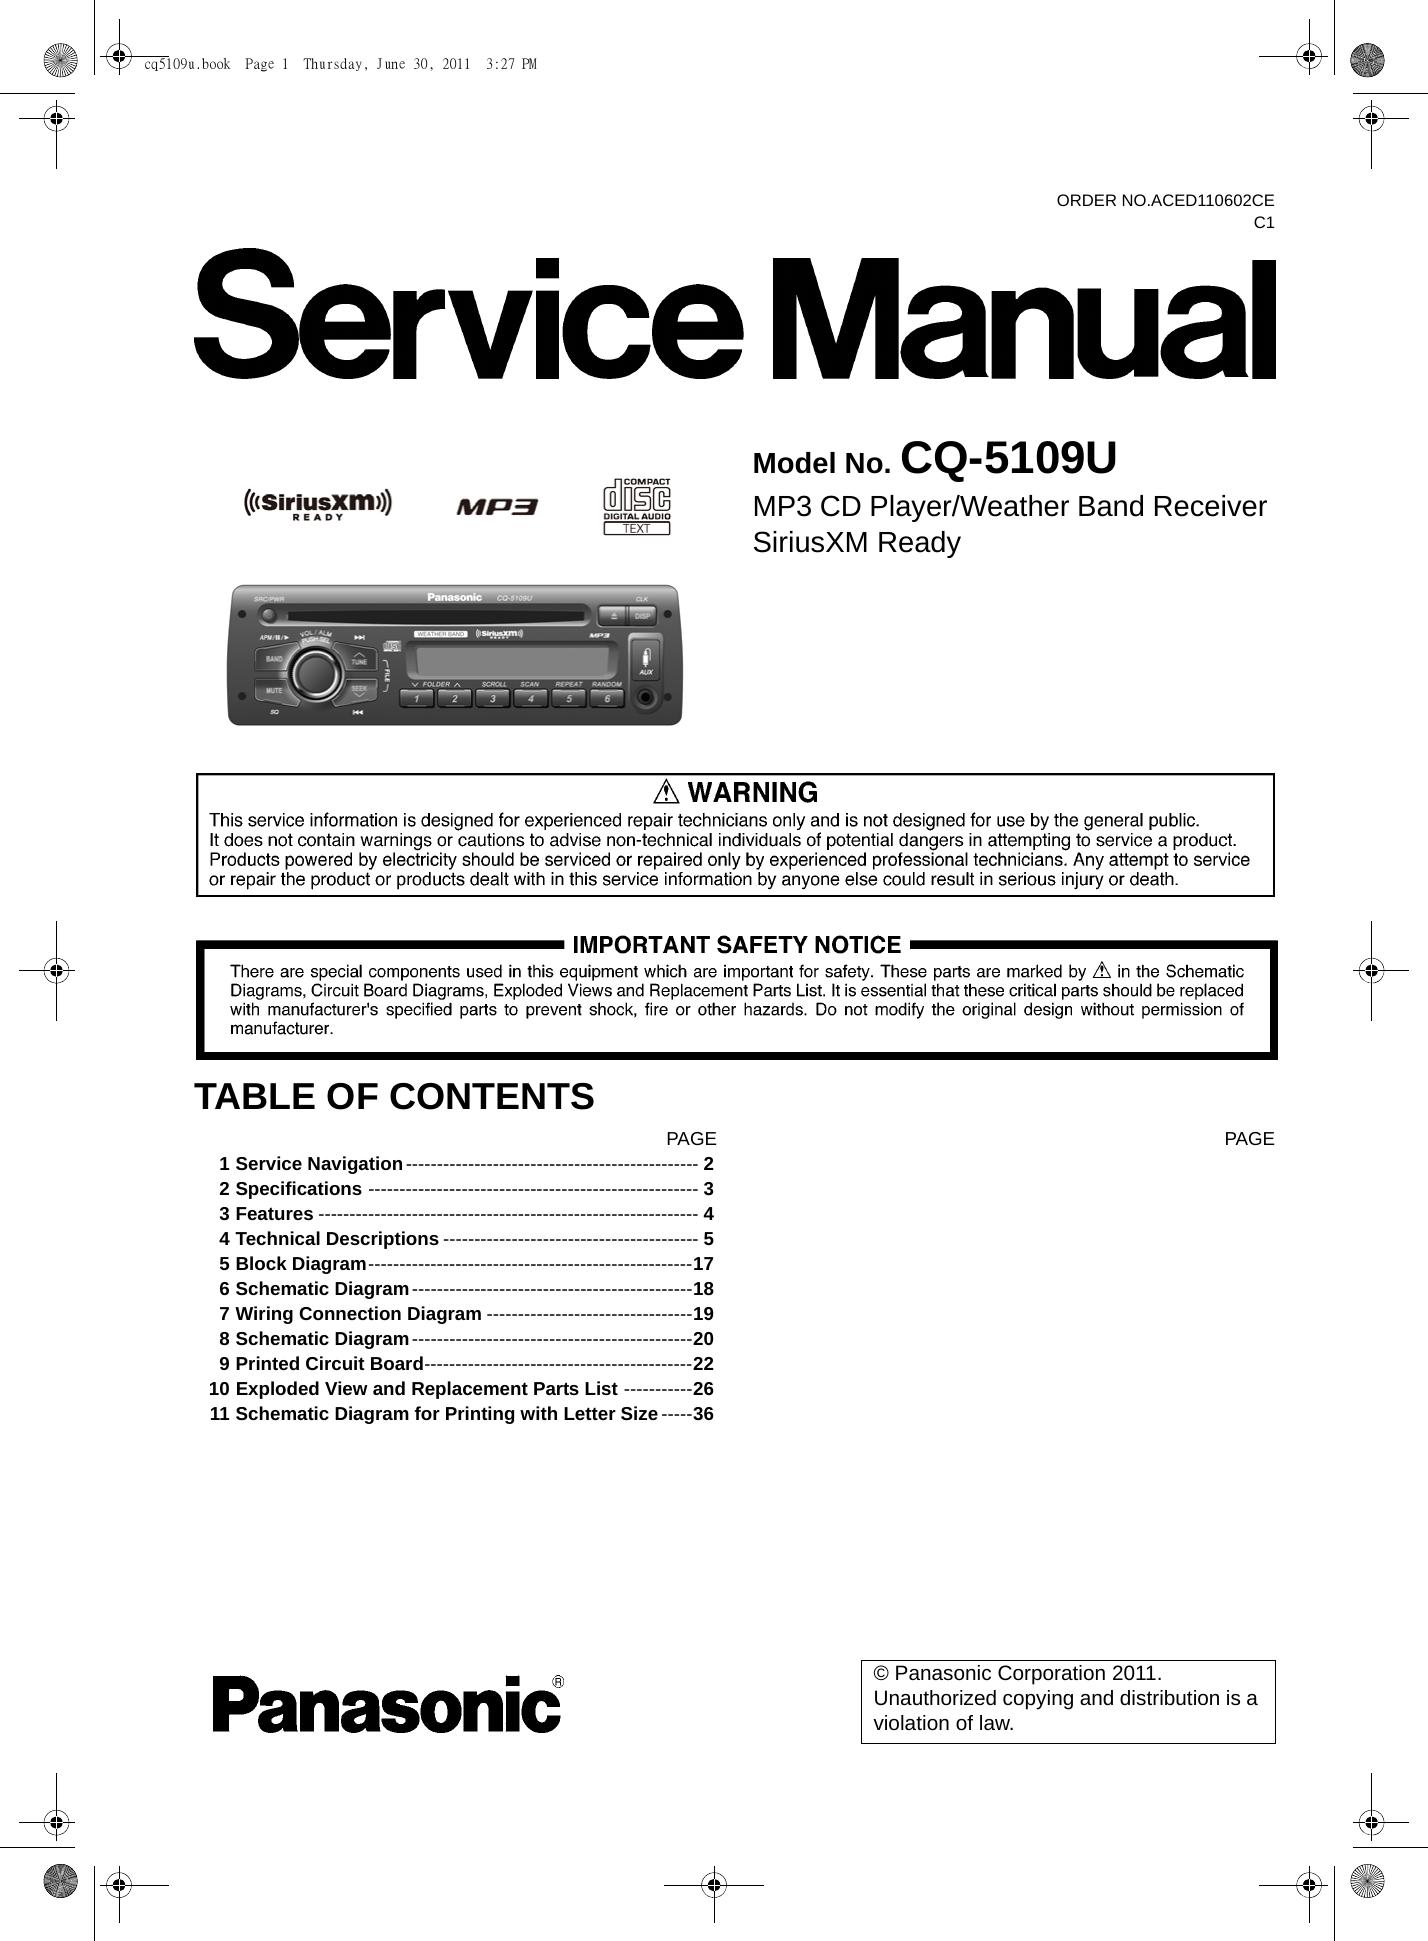 Cq5109u Panasonic Cq 5109u Manual